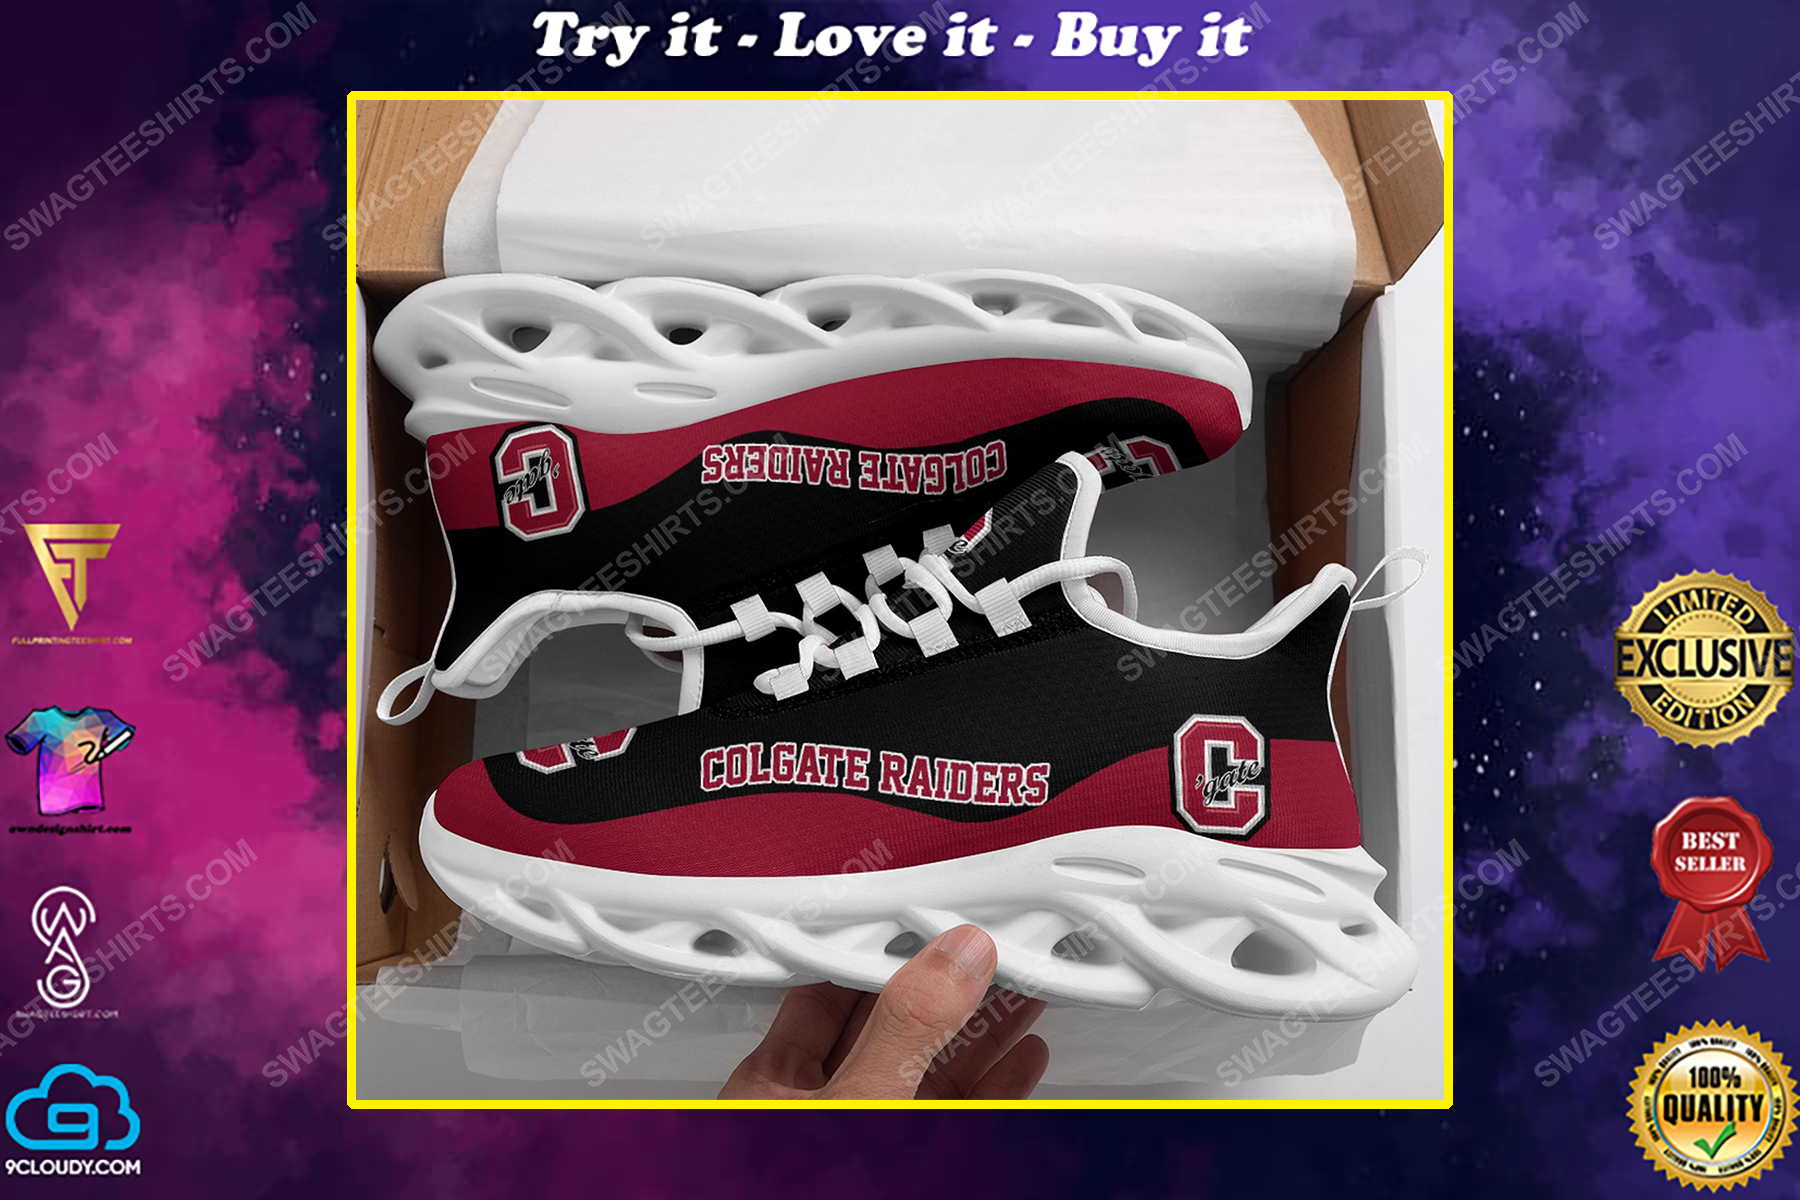 The colgate raiders football team max soul shoes